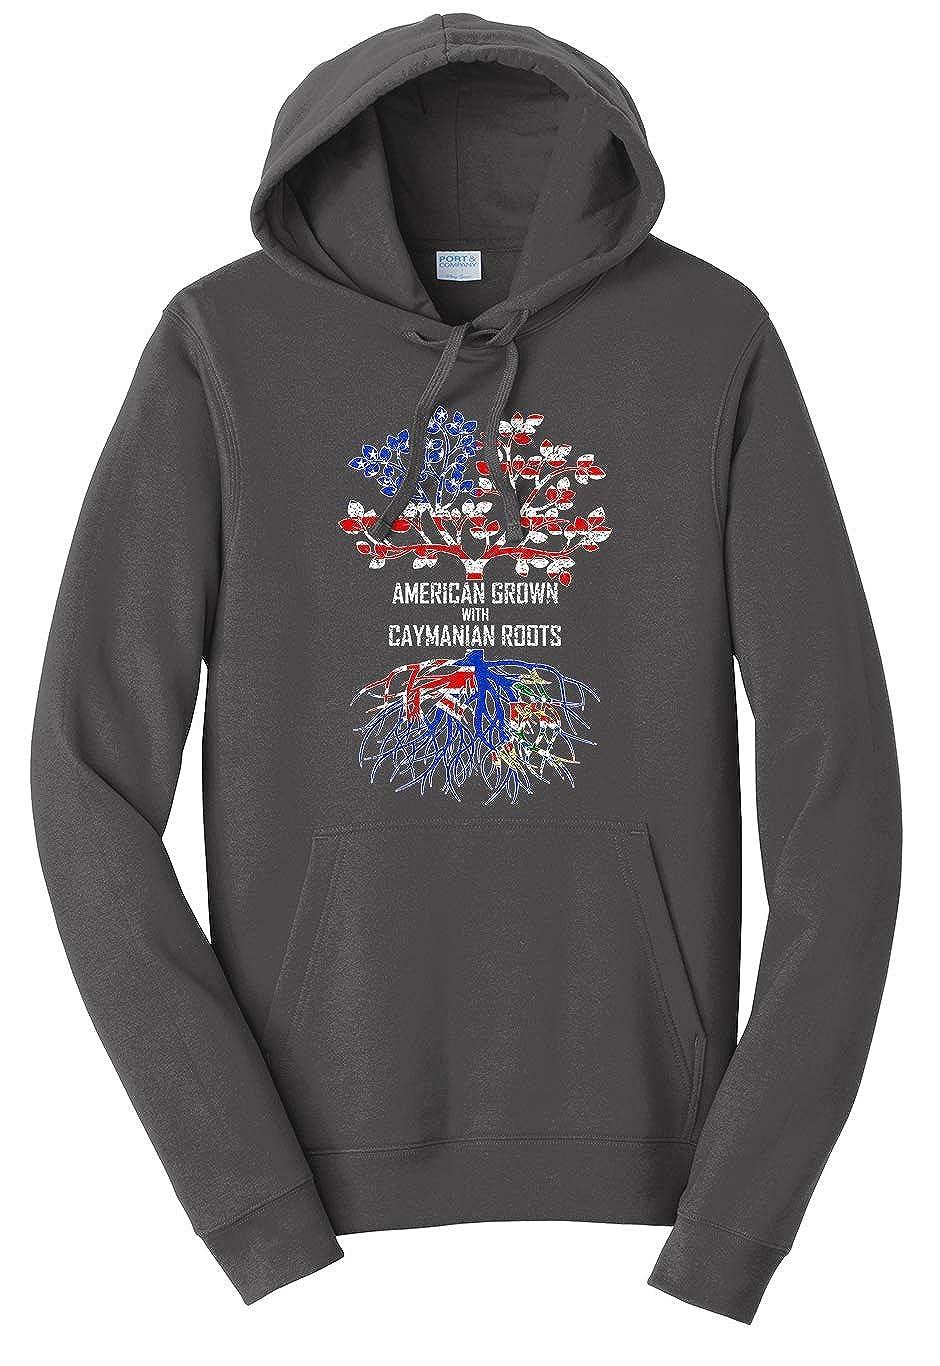 Tenacitee Unisex American Grown with Caymanian Roots Sweatshirt